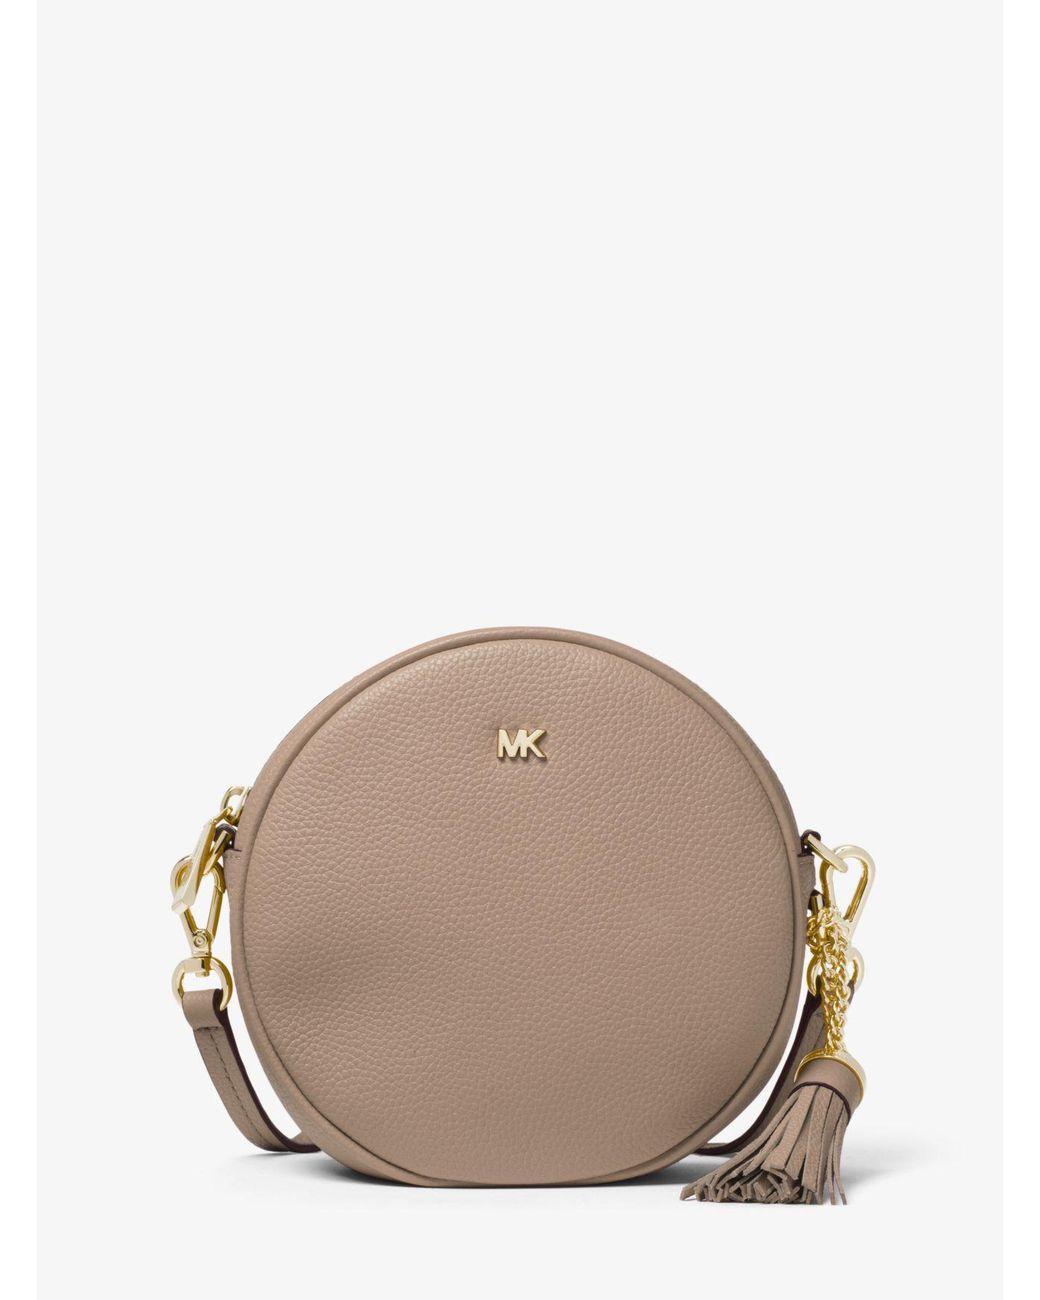 9d7380a74f0c MICHAEL Michael Kors. Women s Brown Mercer Medium Pebbled Leather Canteen  Crossbody